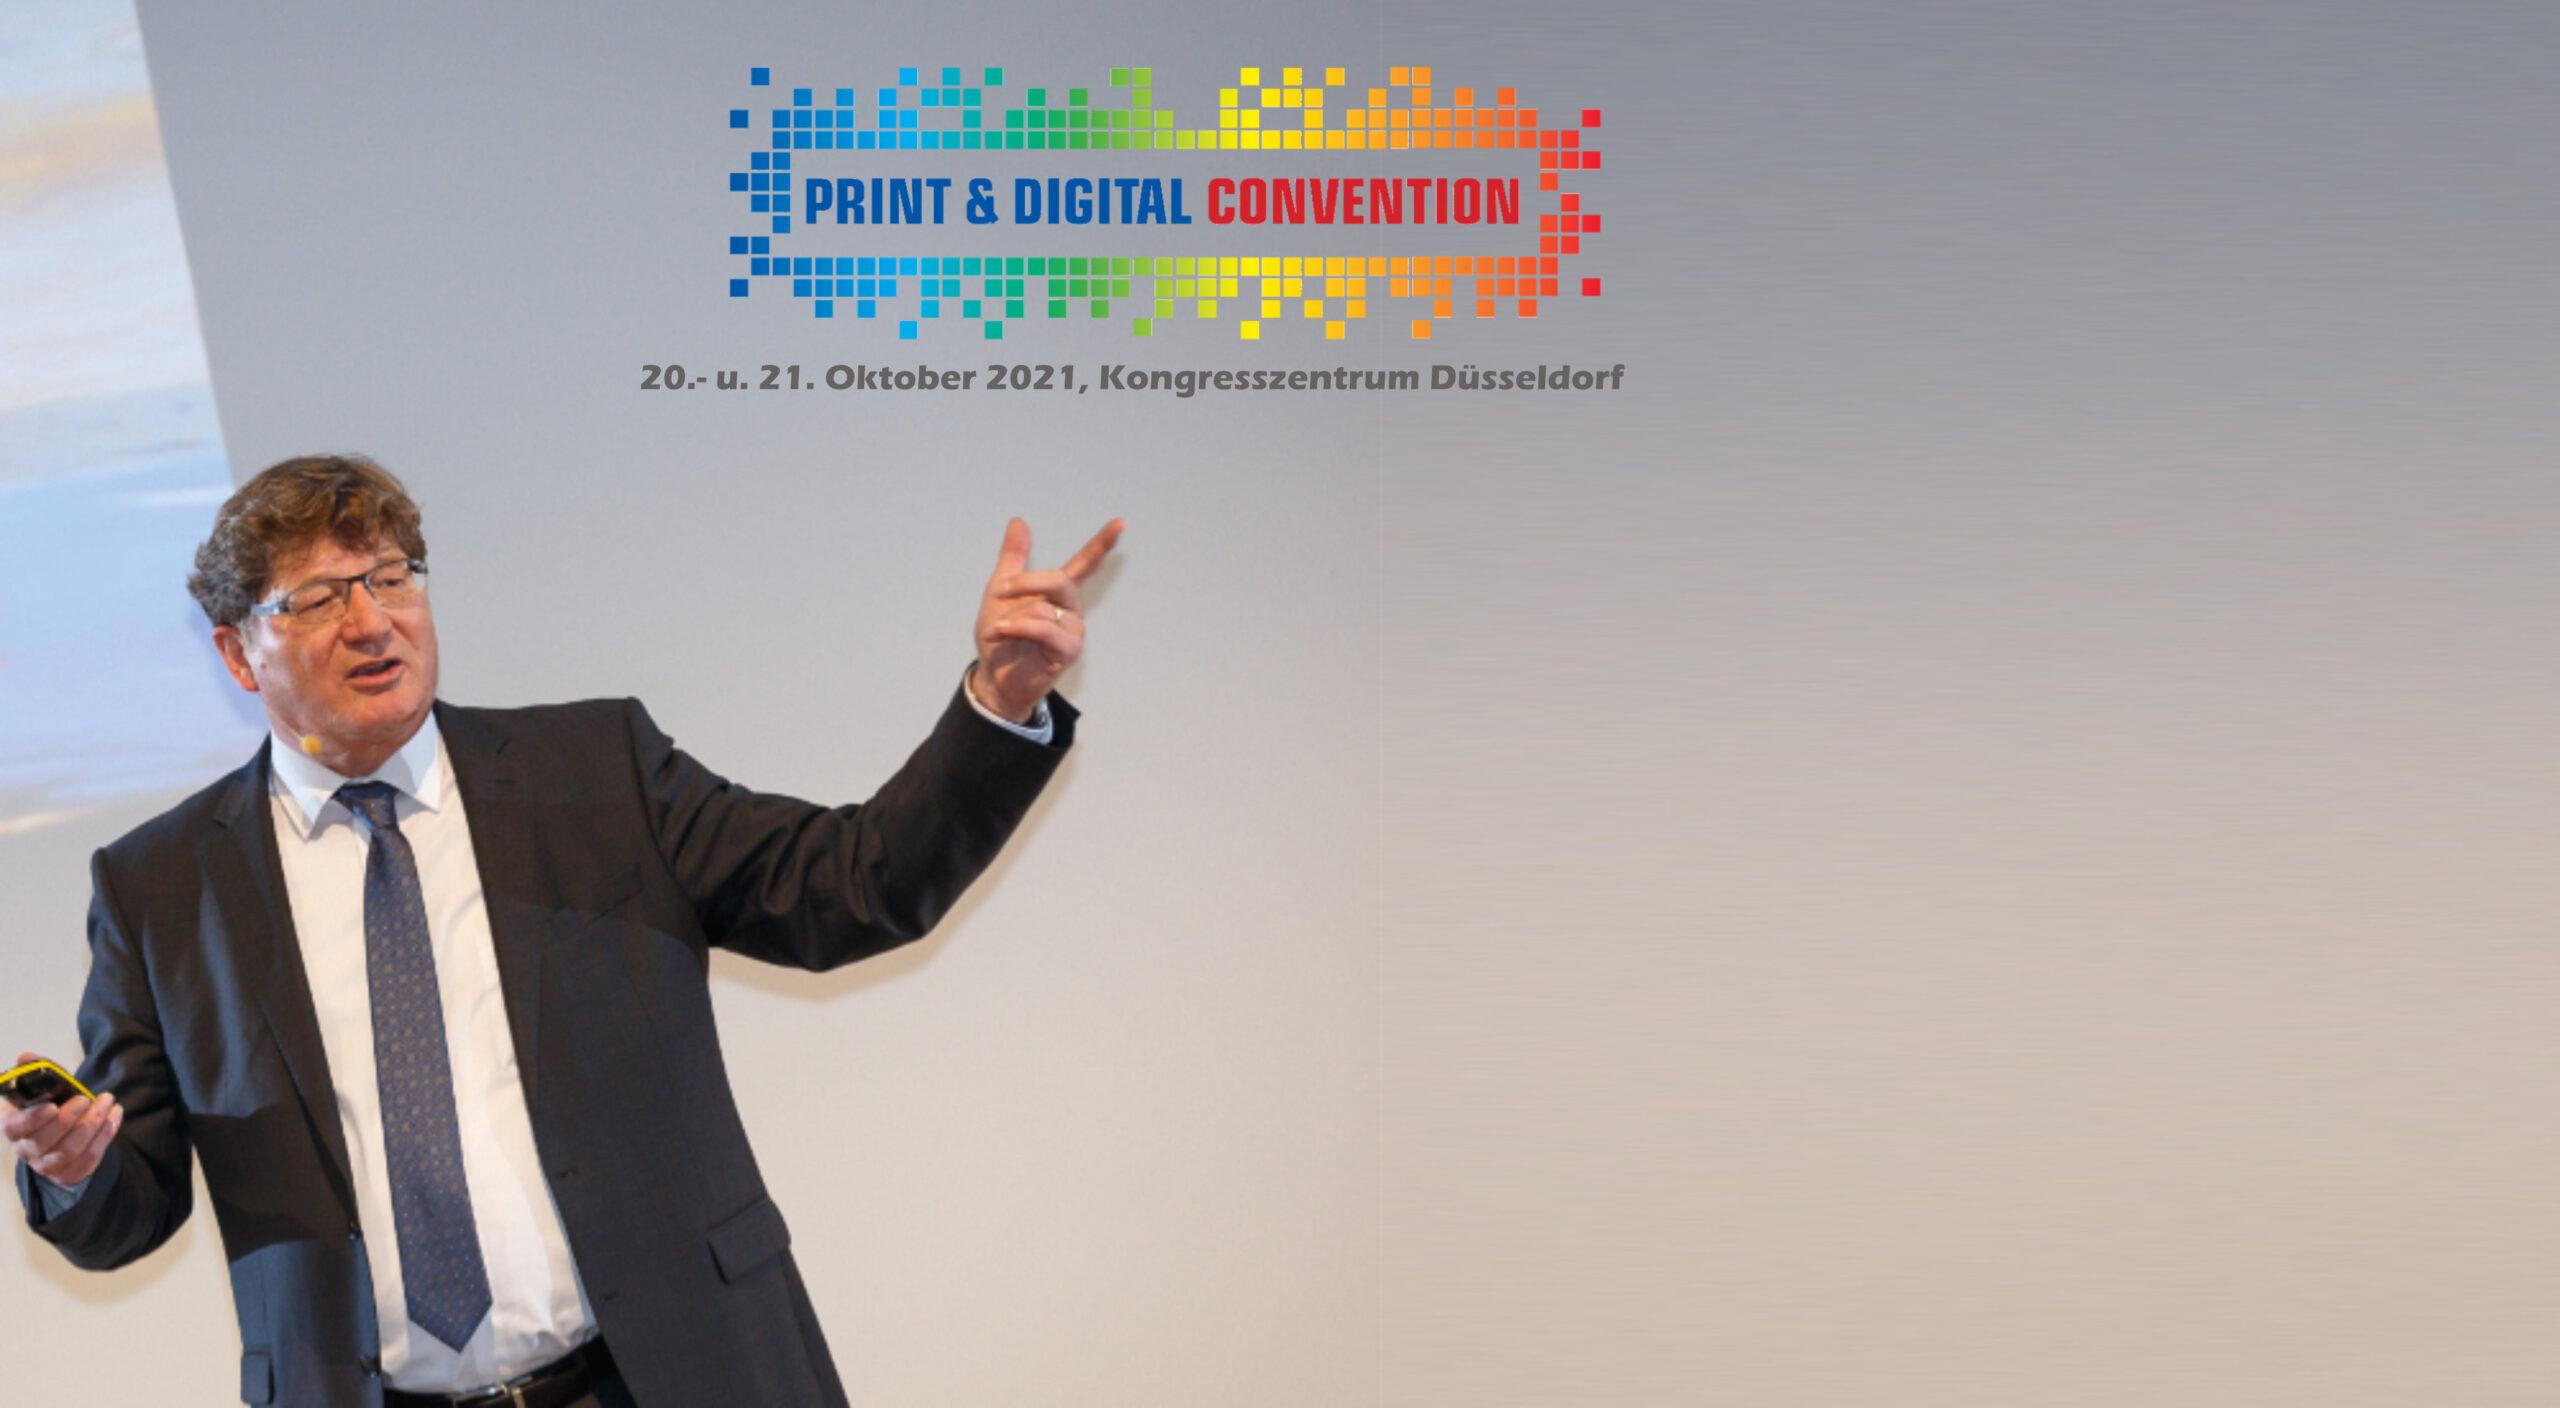 Gerhard Märtterer, Digitaldruckexperte